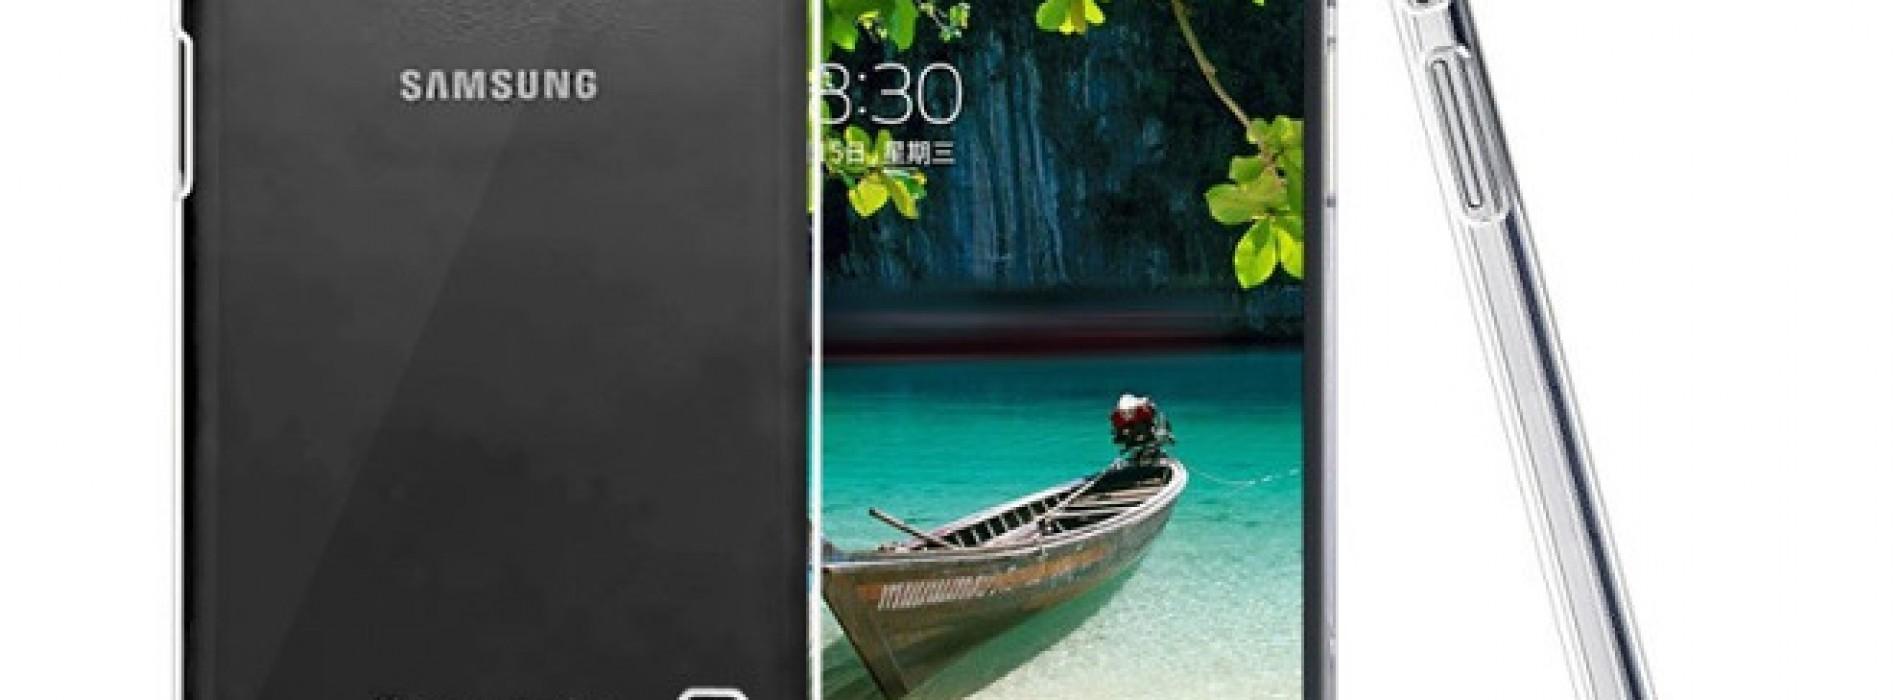 Leaked image shows gigantic 7-inch Samsung Galaxy Mega 2